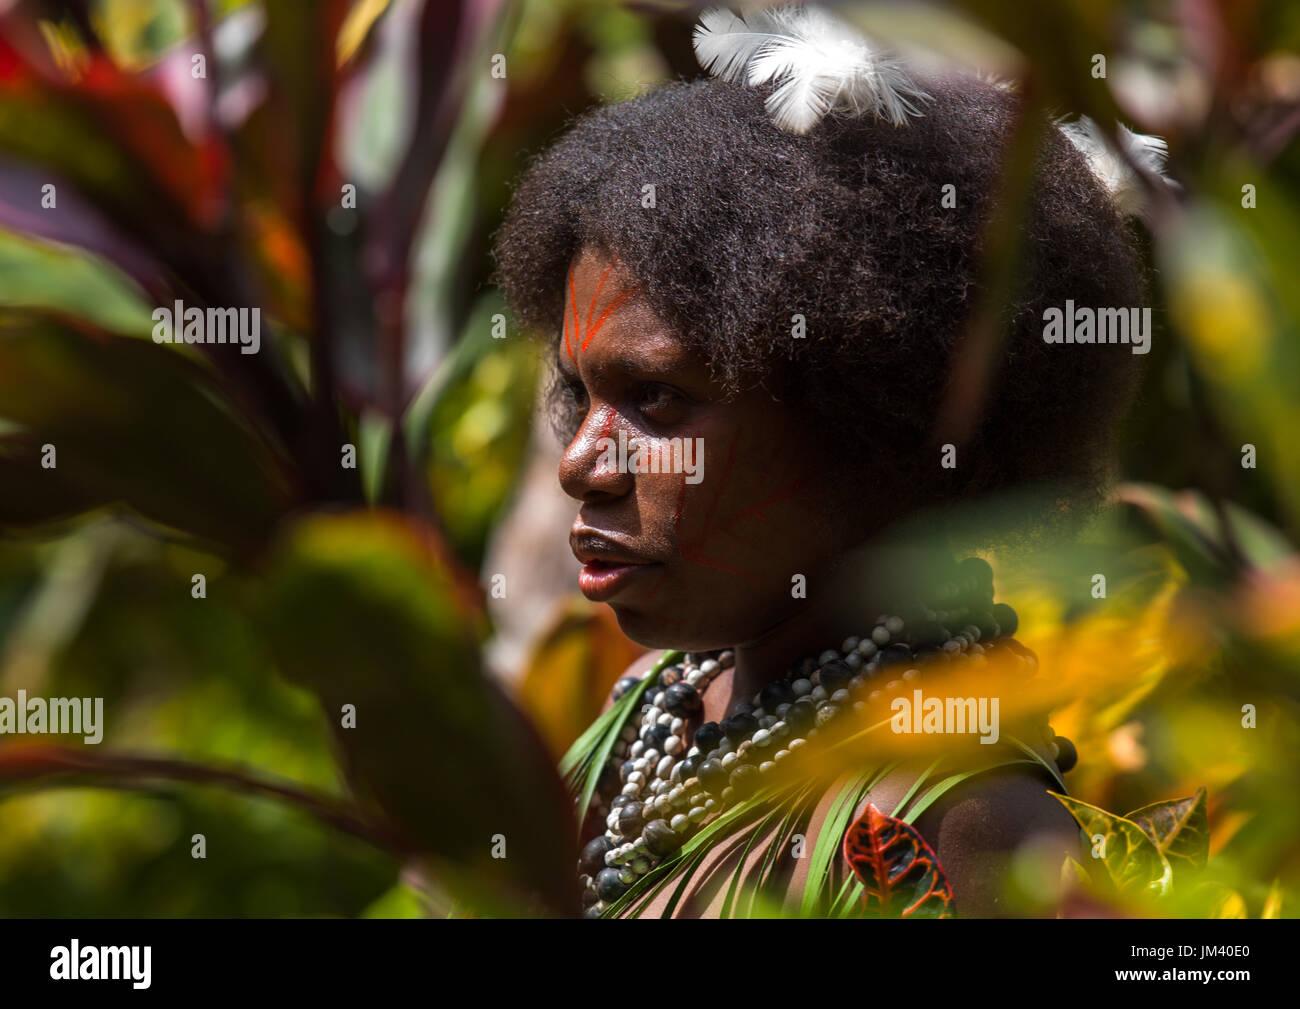 Portrait of a Small Nambas tribeswomen, Malekula island, Gortiengser, Vanuatu - Stock Image